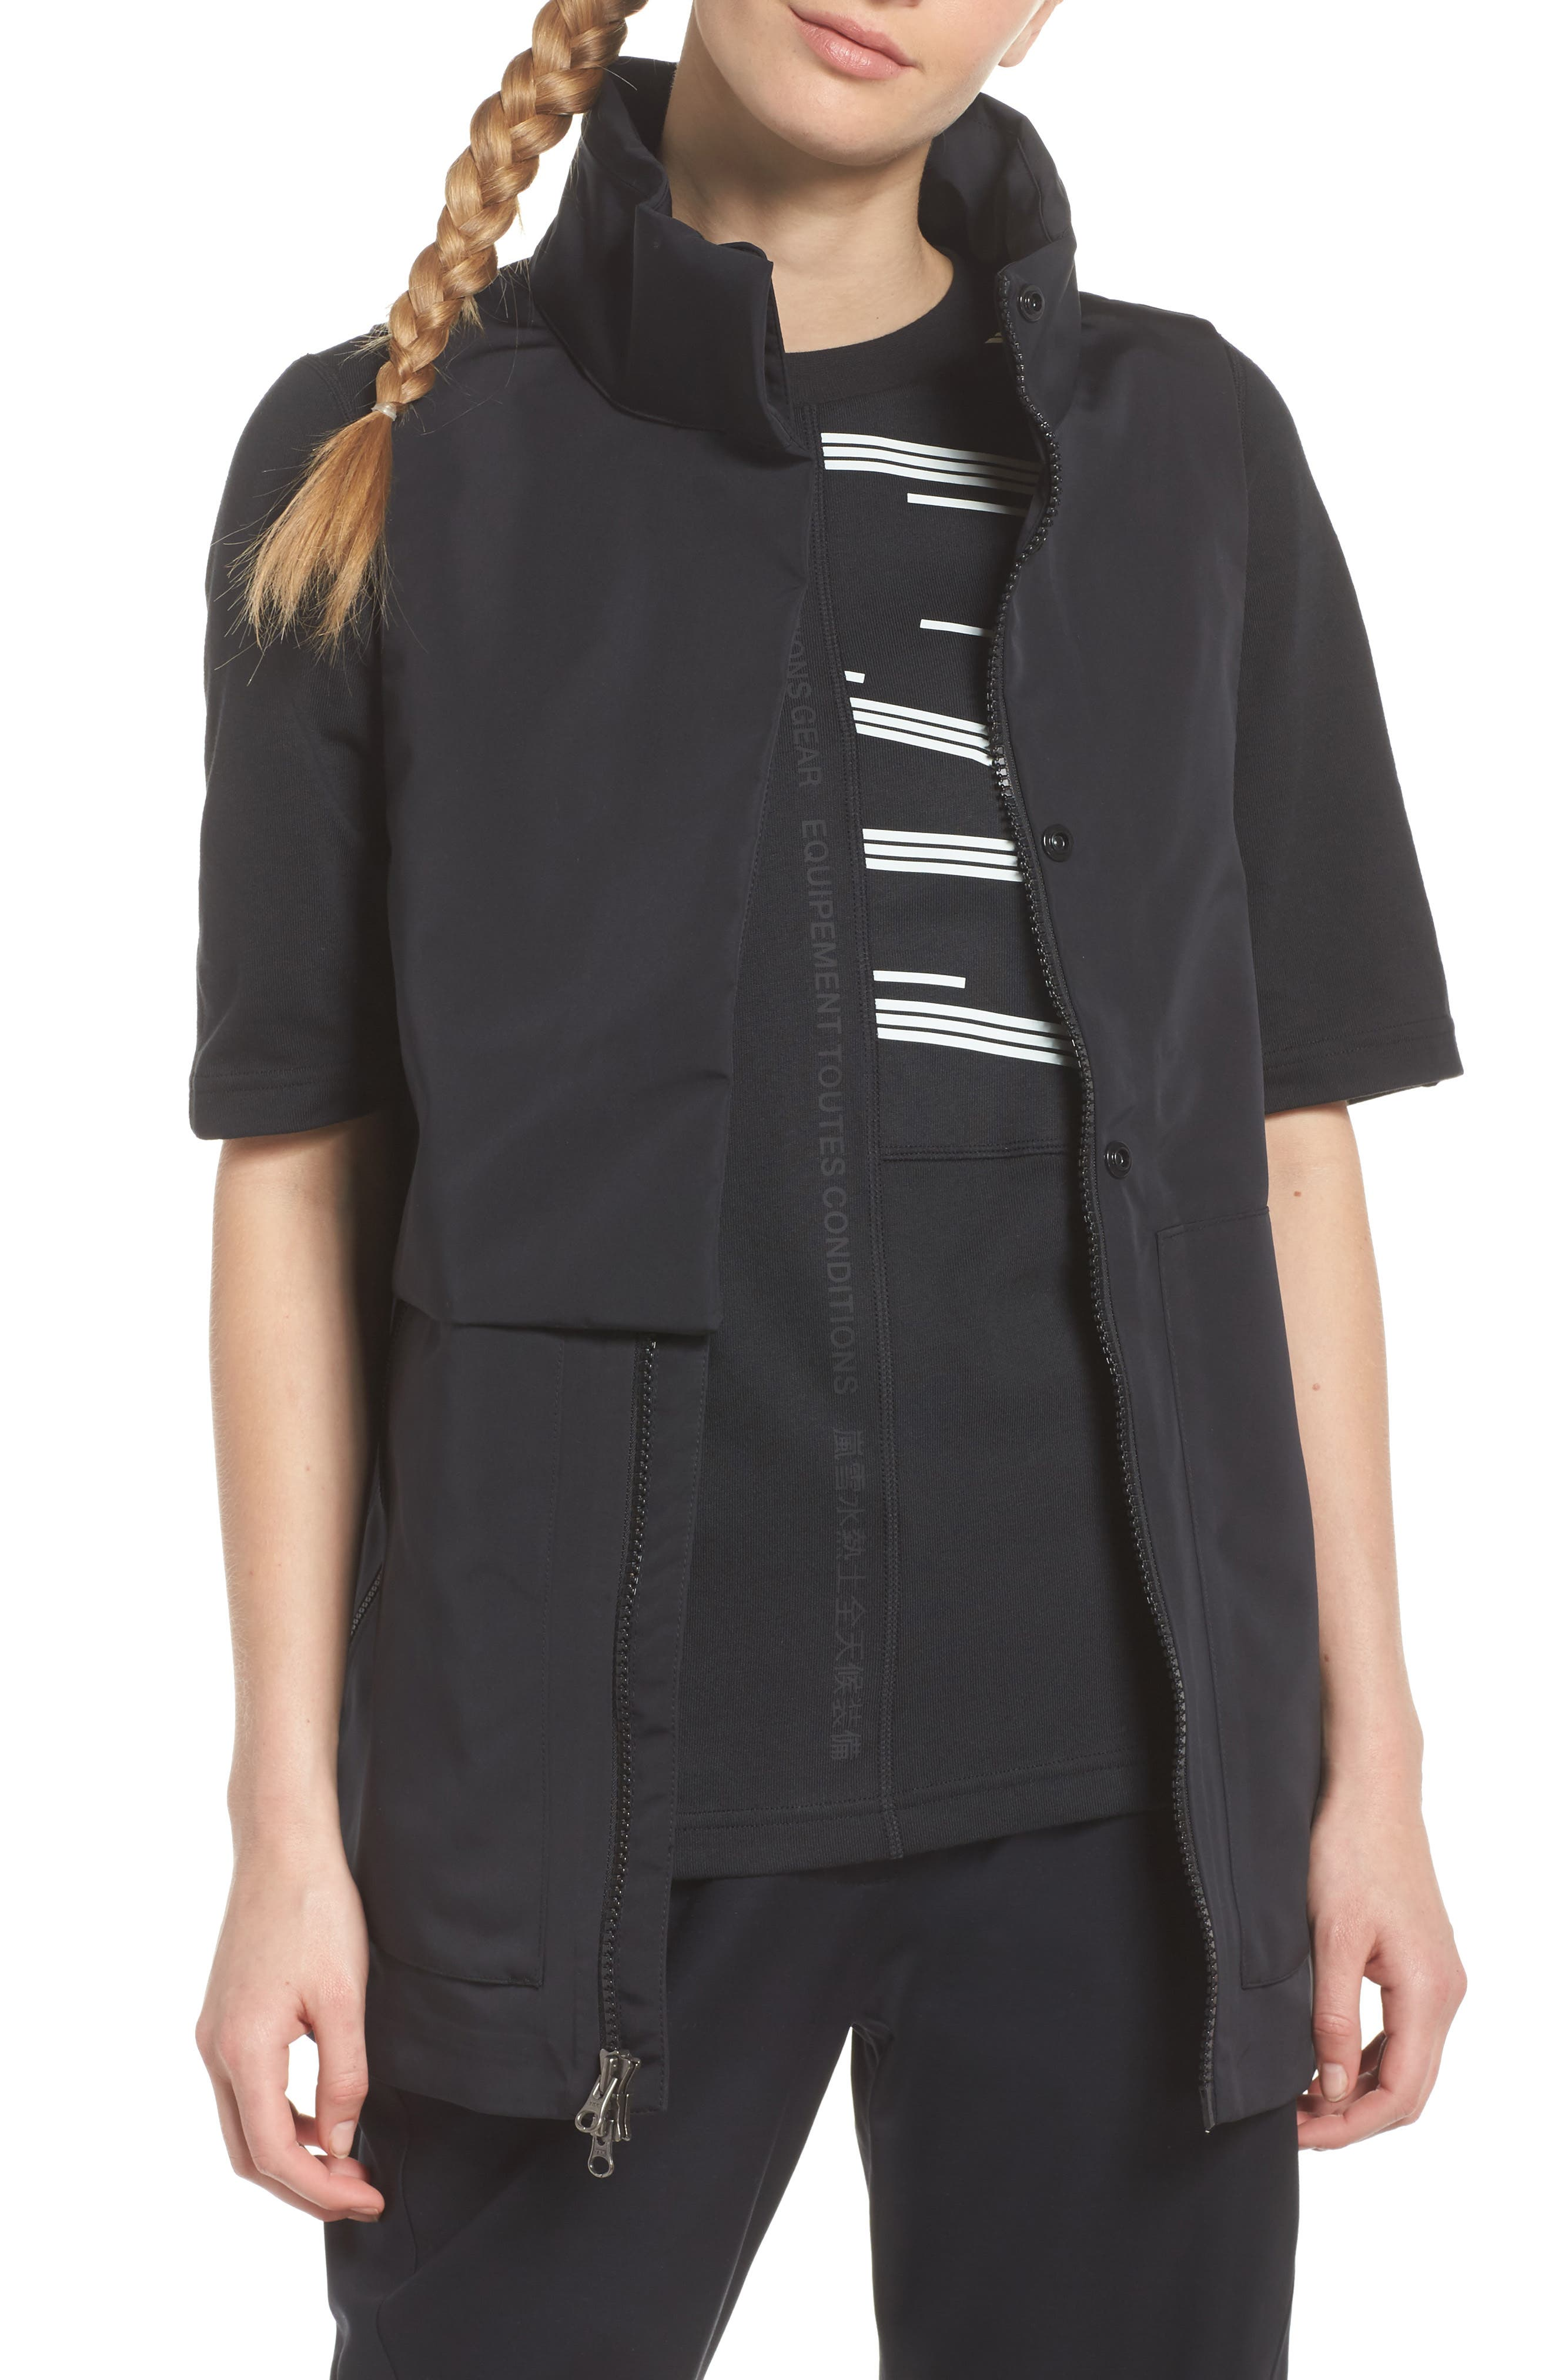 NikeLab ACG Water Repellent Women's Hooded Vest,                             Main thumbnail 1, color,                             010